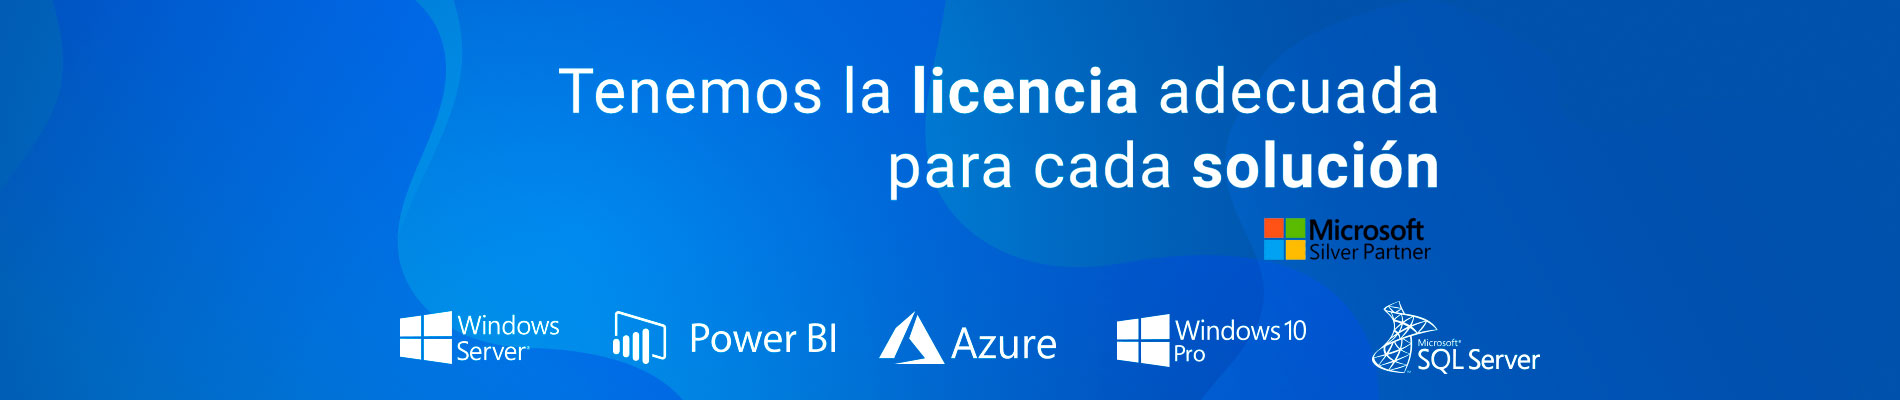 banner_licencias_datapro2